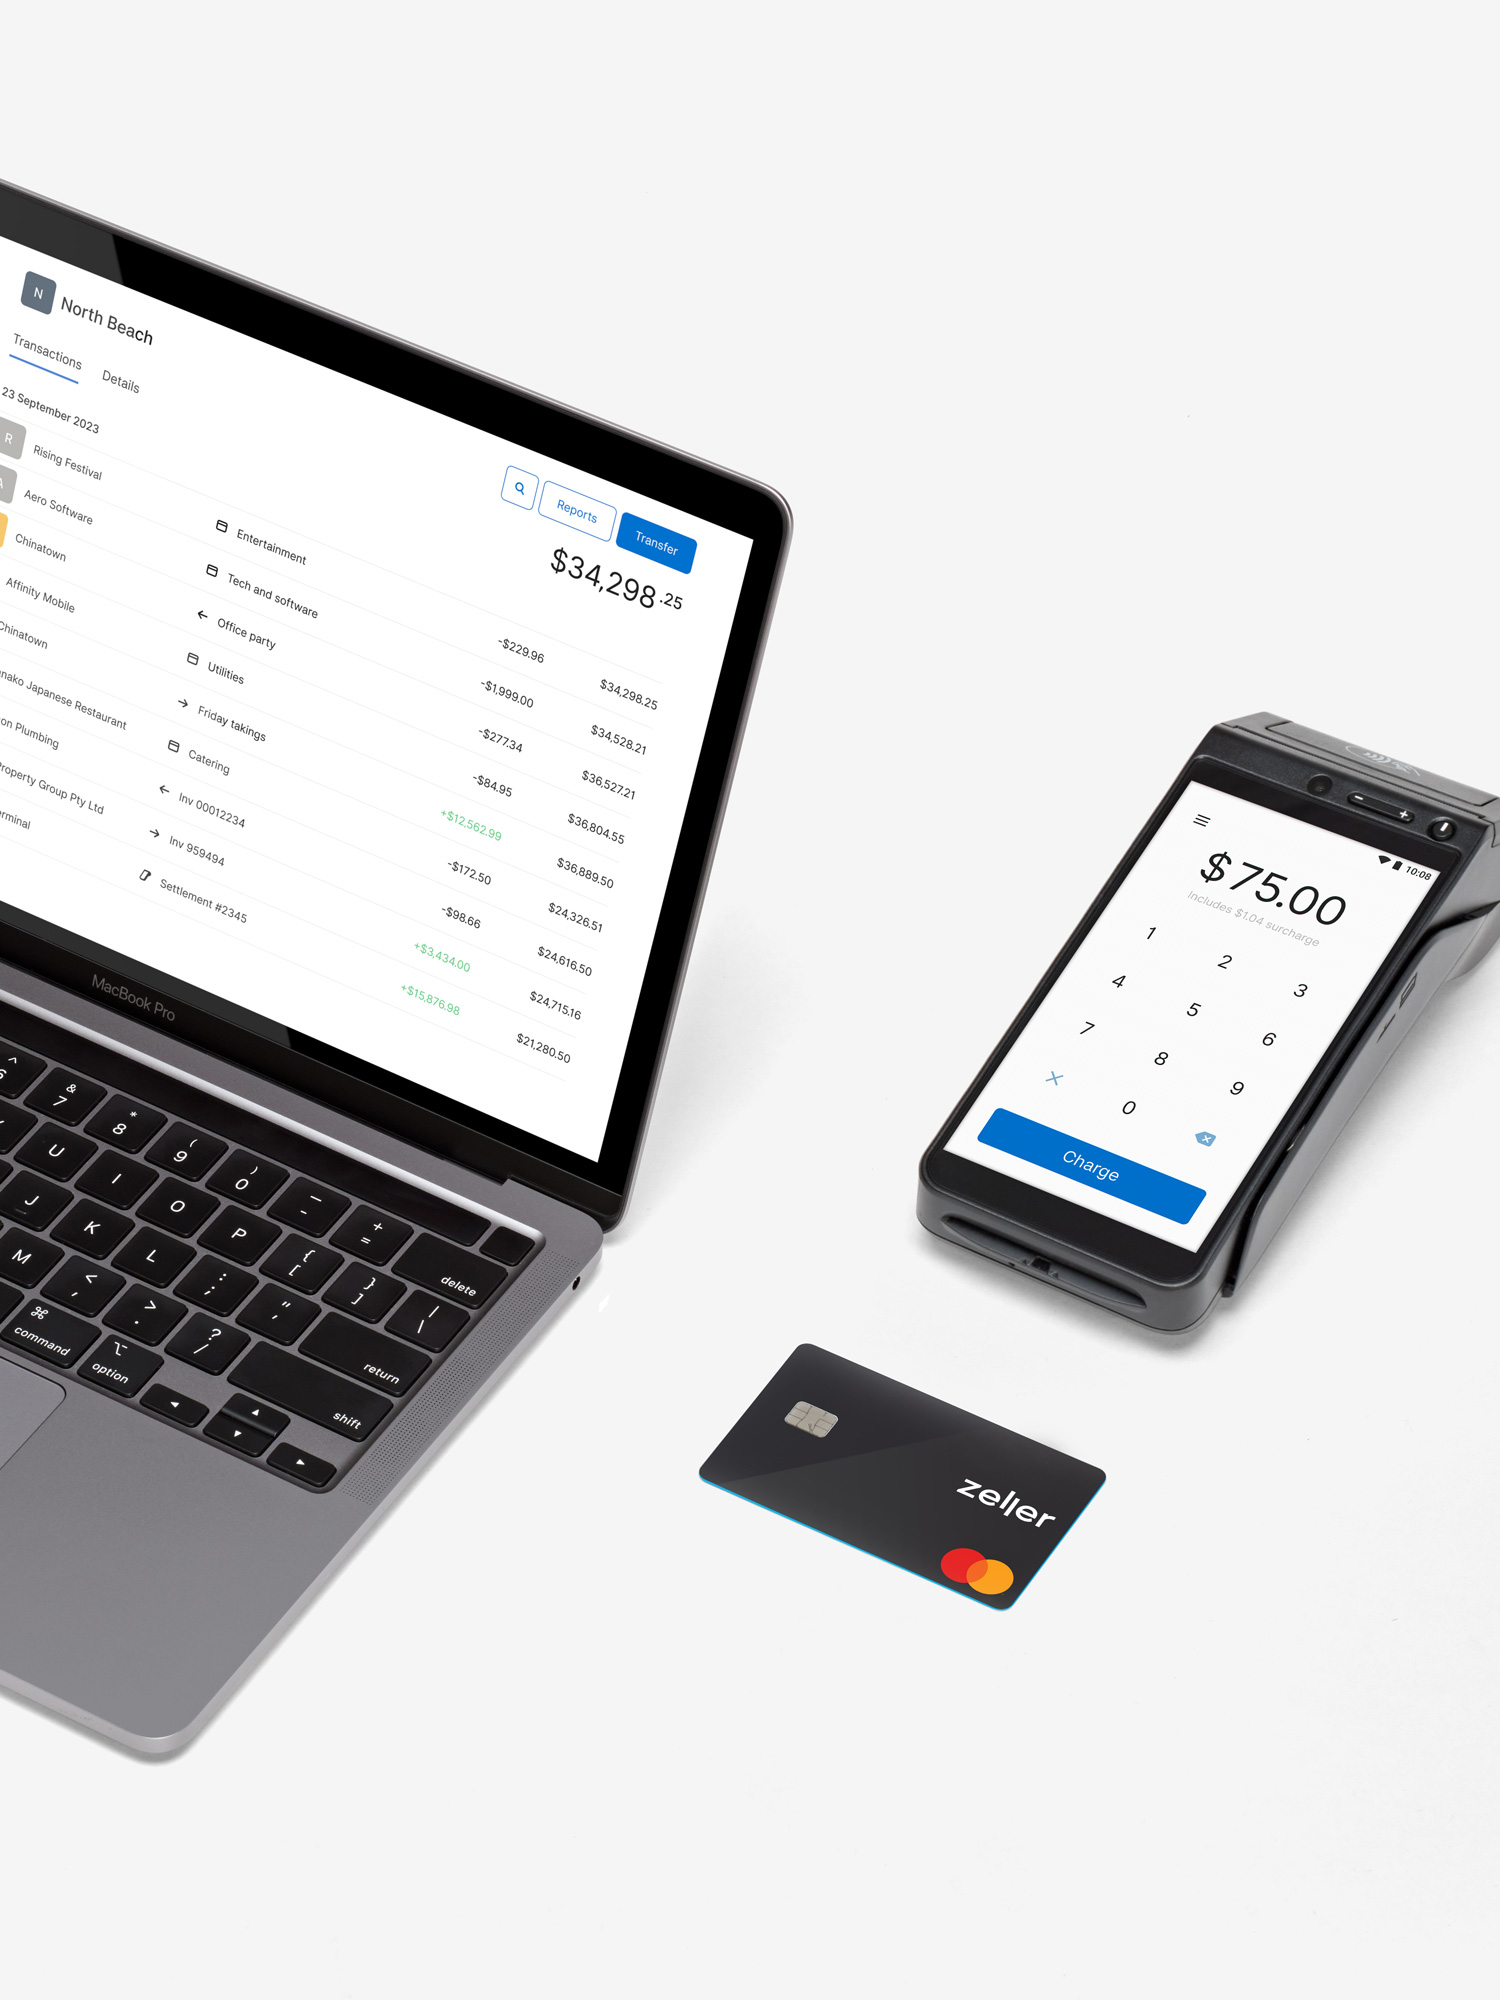 eftpos-terminal-business-bank-account-mastercard